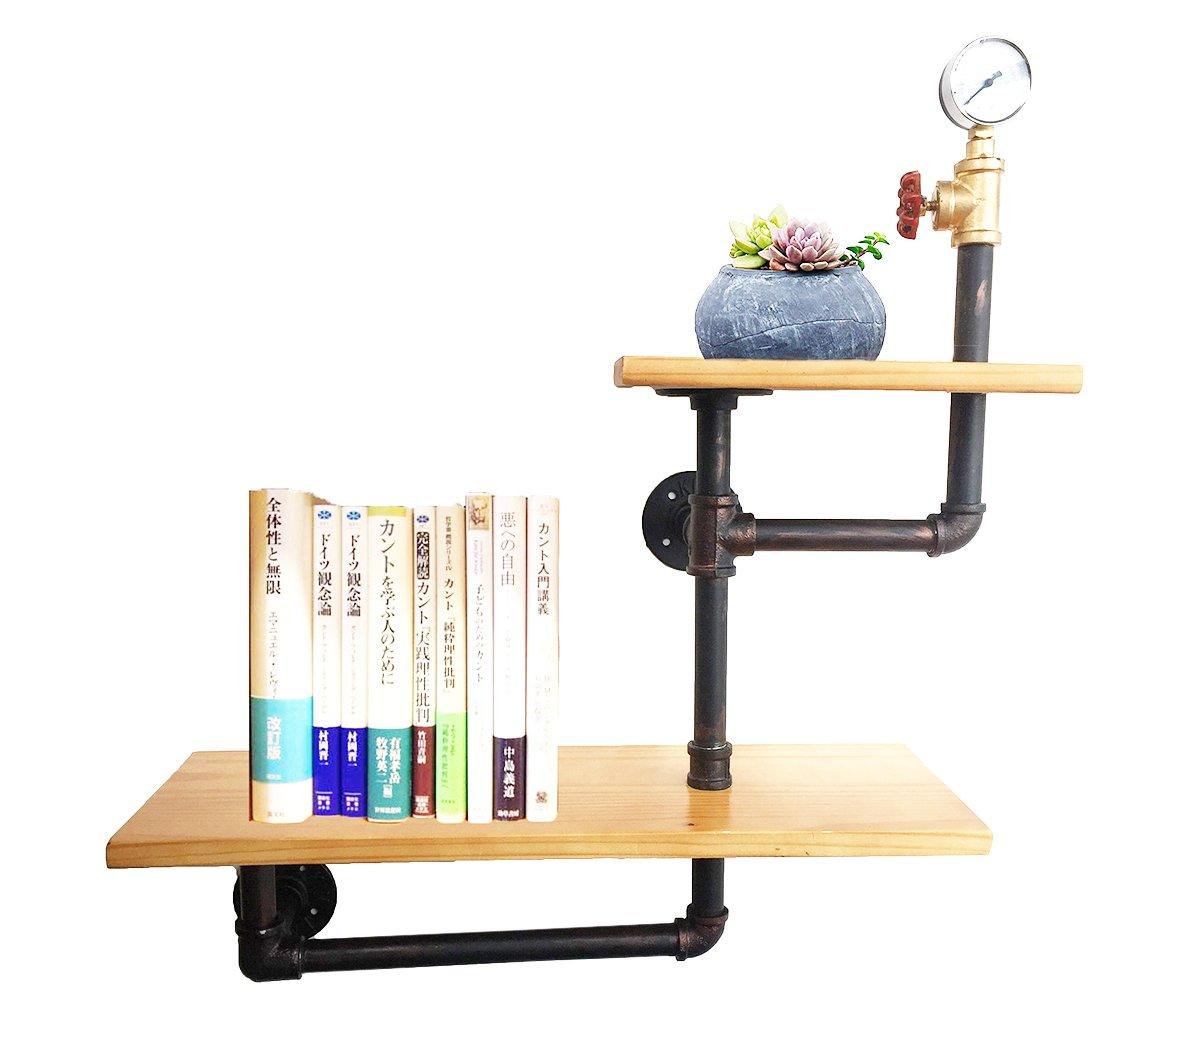 KALER Industrial Pipe Shelf wall mounted brackets shelves Hanging Wall Diy Decor Pipe Bookshelf-2 Tier